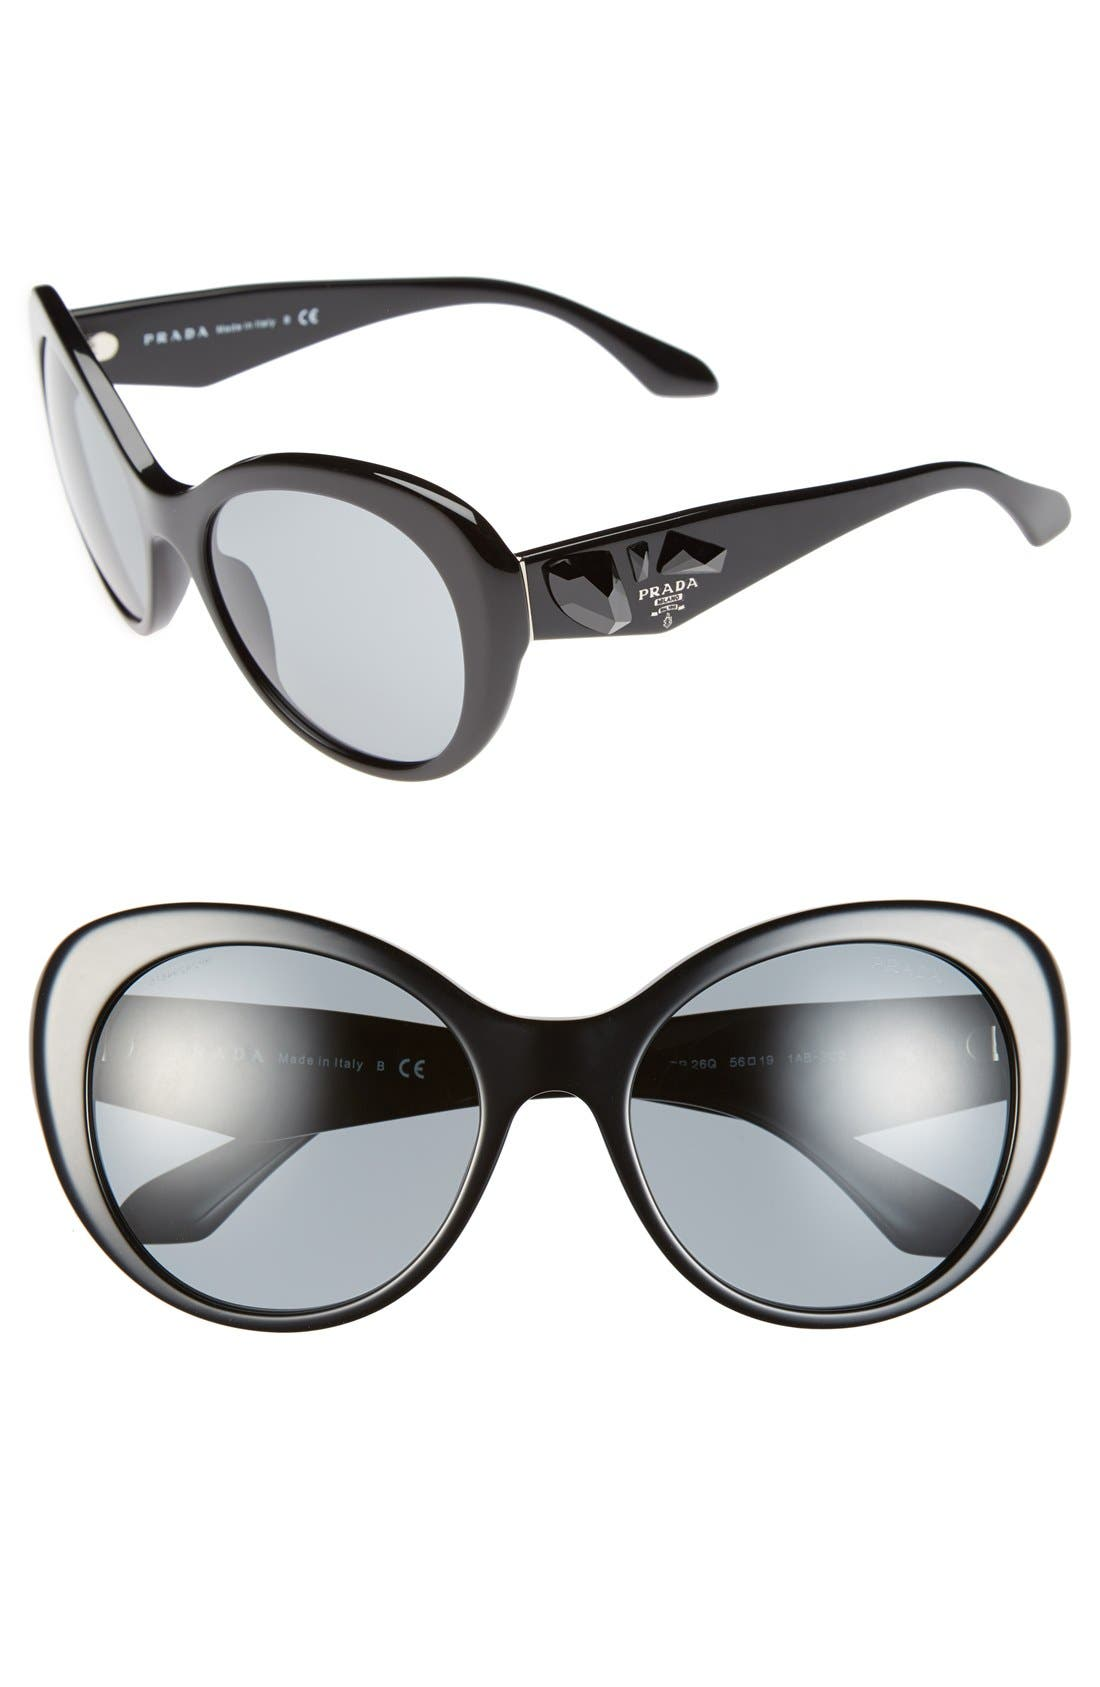 Main Image - Prada 'Voice' 56mm Sunglasses